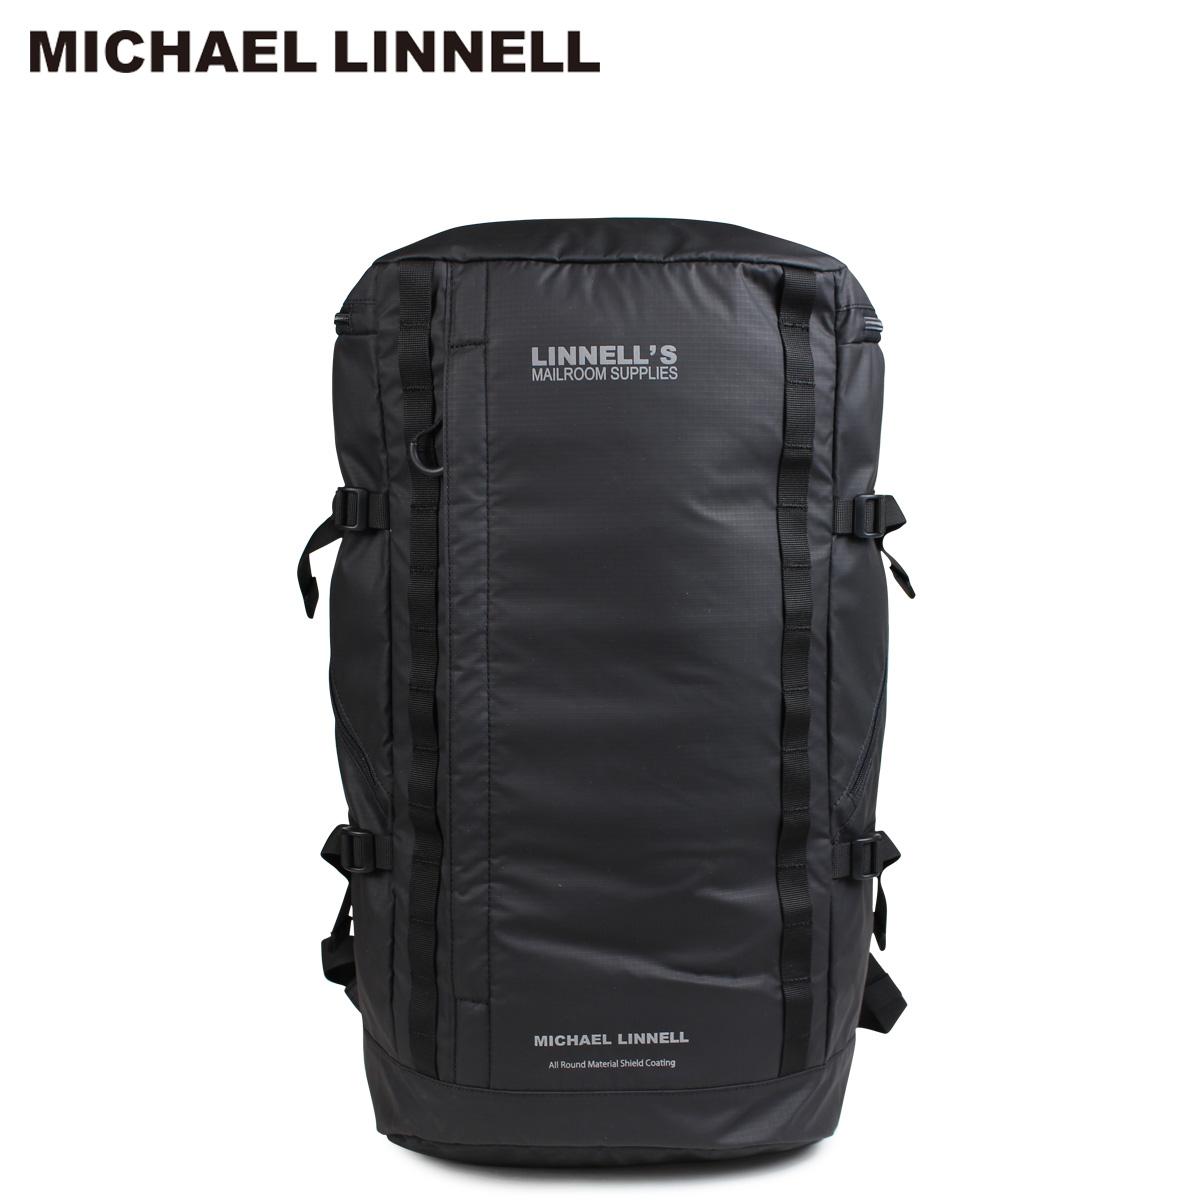 MICHAEL LINNELL マイケルリンネル リュック バッグ メンズ レディース バックパック BACKPACK ブラック 黒 MLAC-03